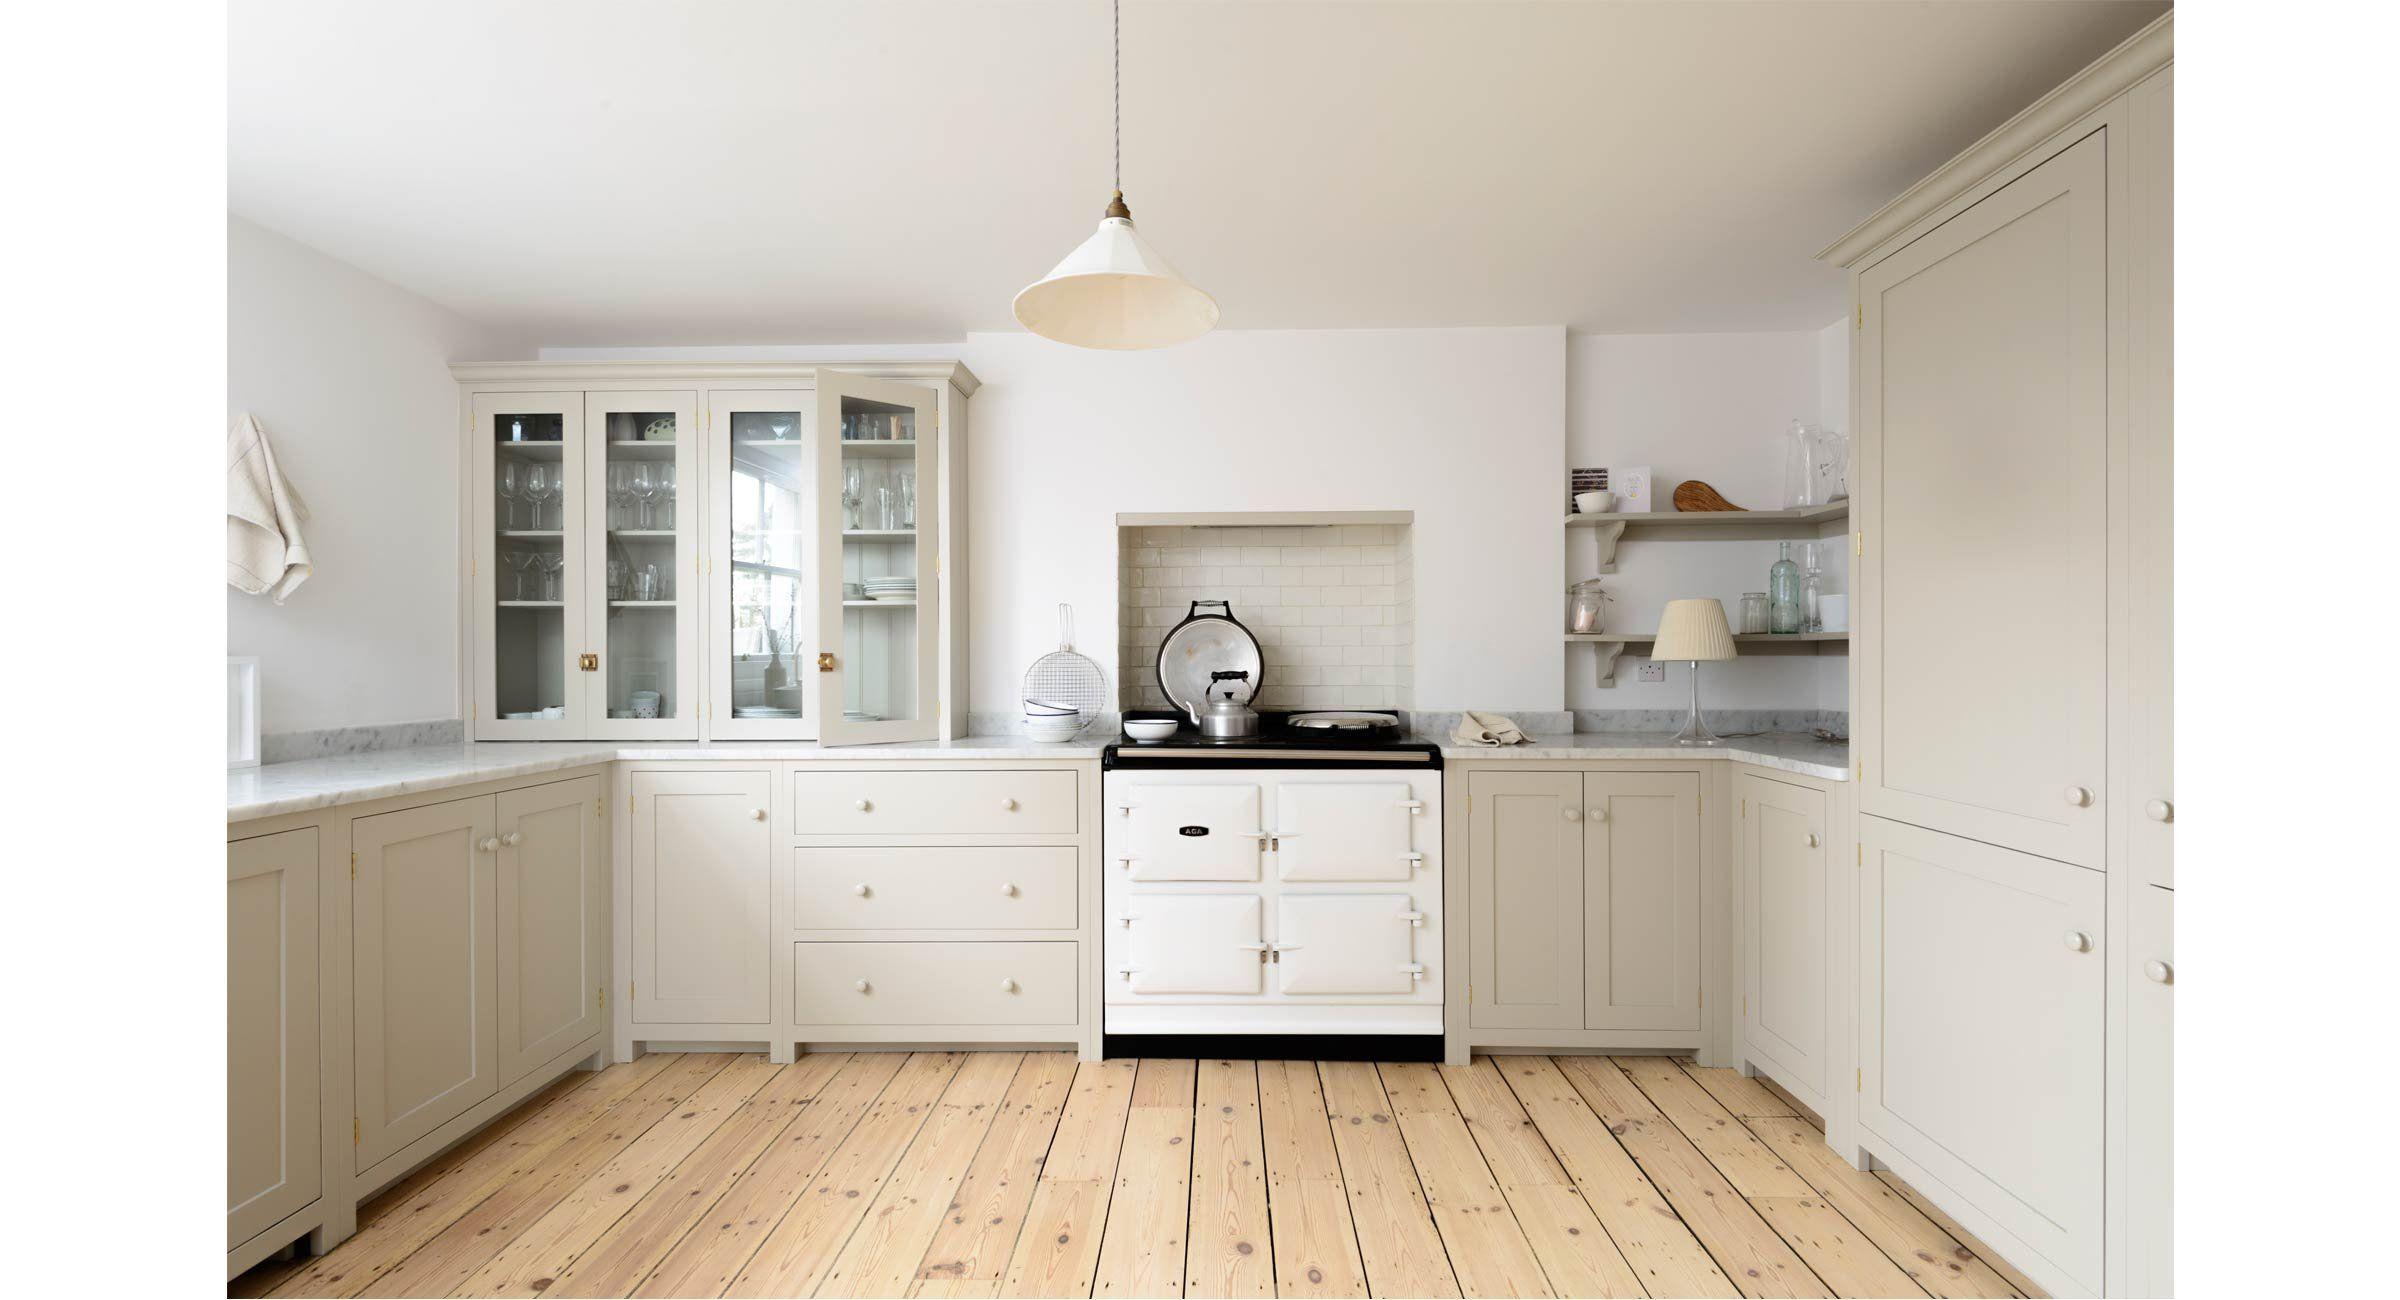 Brighton Kitchen | deVOL Kitchens | Kitchen Images | Pinterest ...